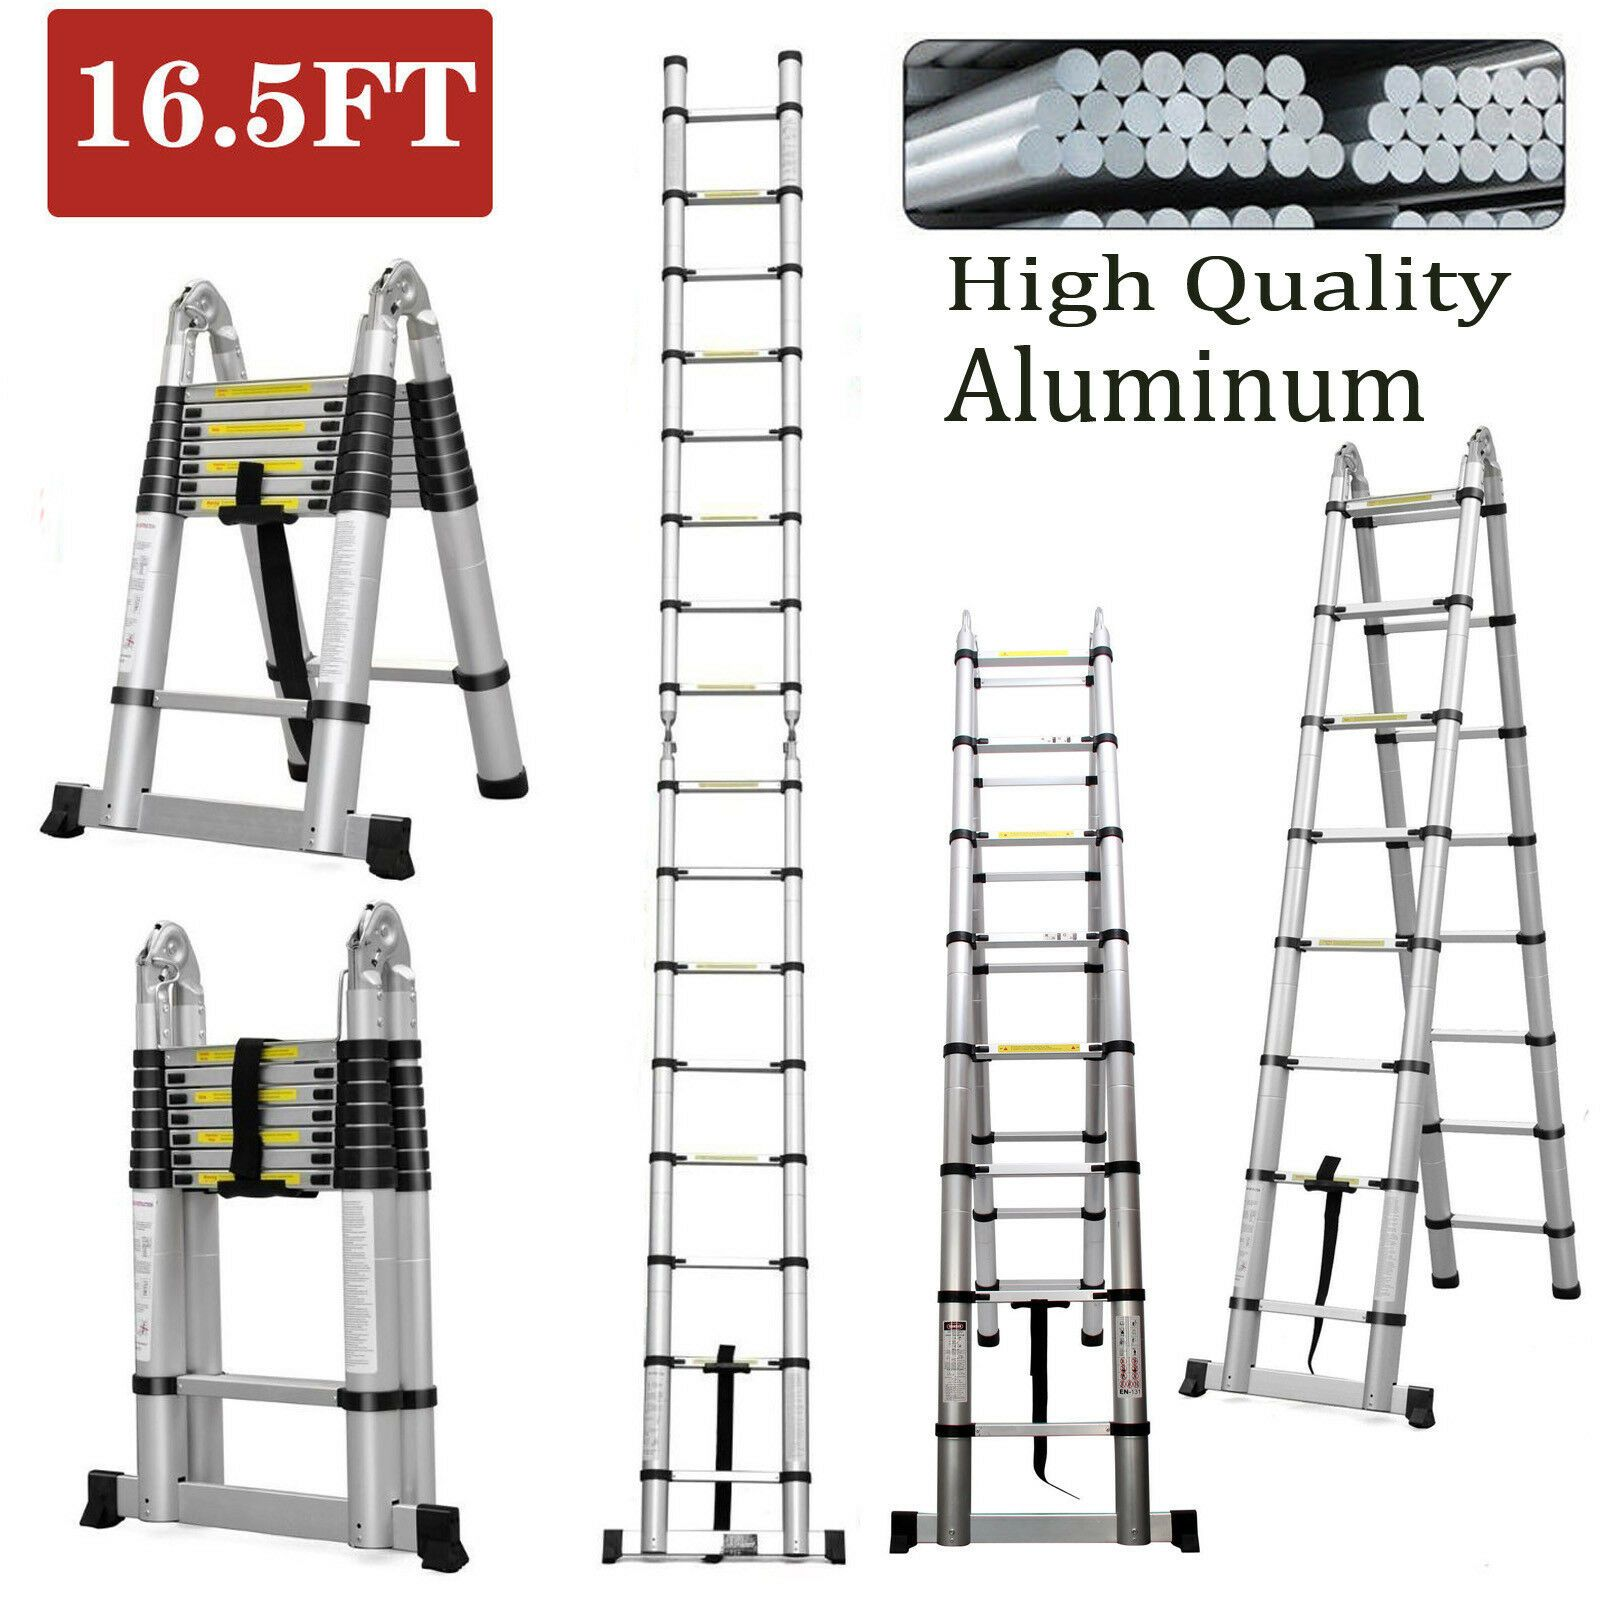 Heavy Duty 16 5 Feet 5m Aluminum Telescopic Extension Step Ladder Multi Purpose Ladder Decor Ladderdecor In 2020 Step Ladders Folding Ladder Telescopic Ladder